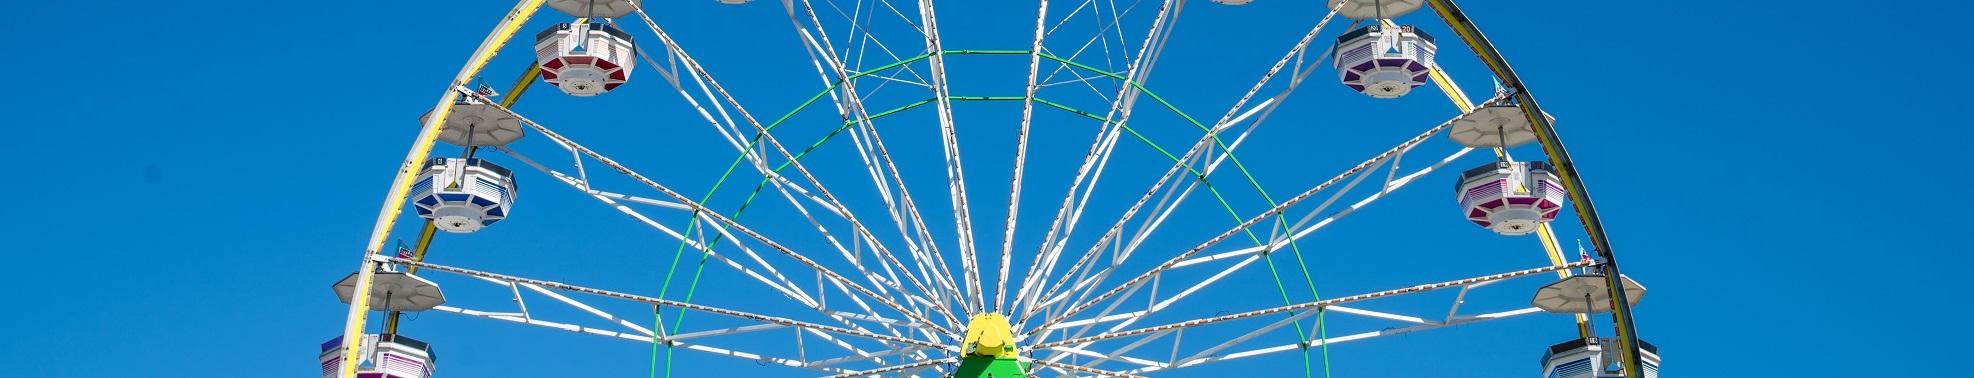 Get your VIP Passes to Coachella Festival 2022